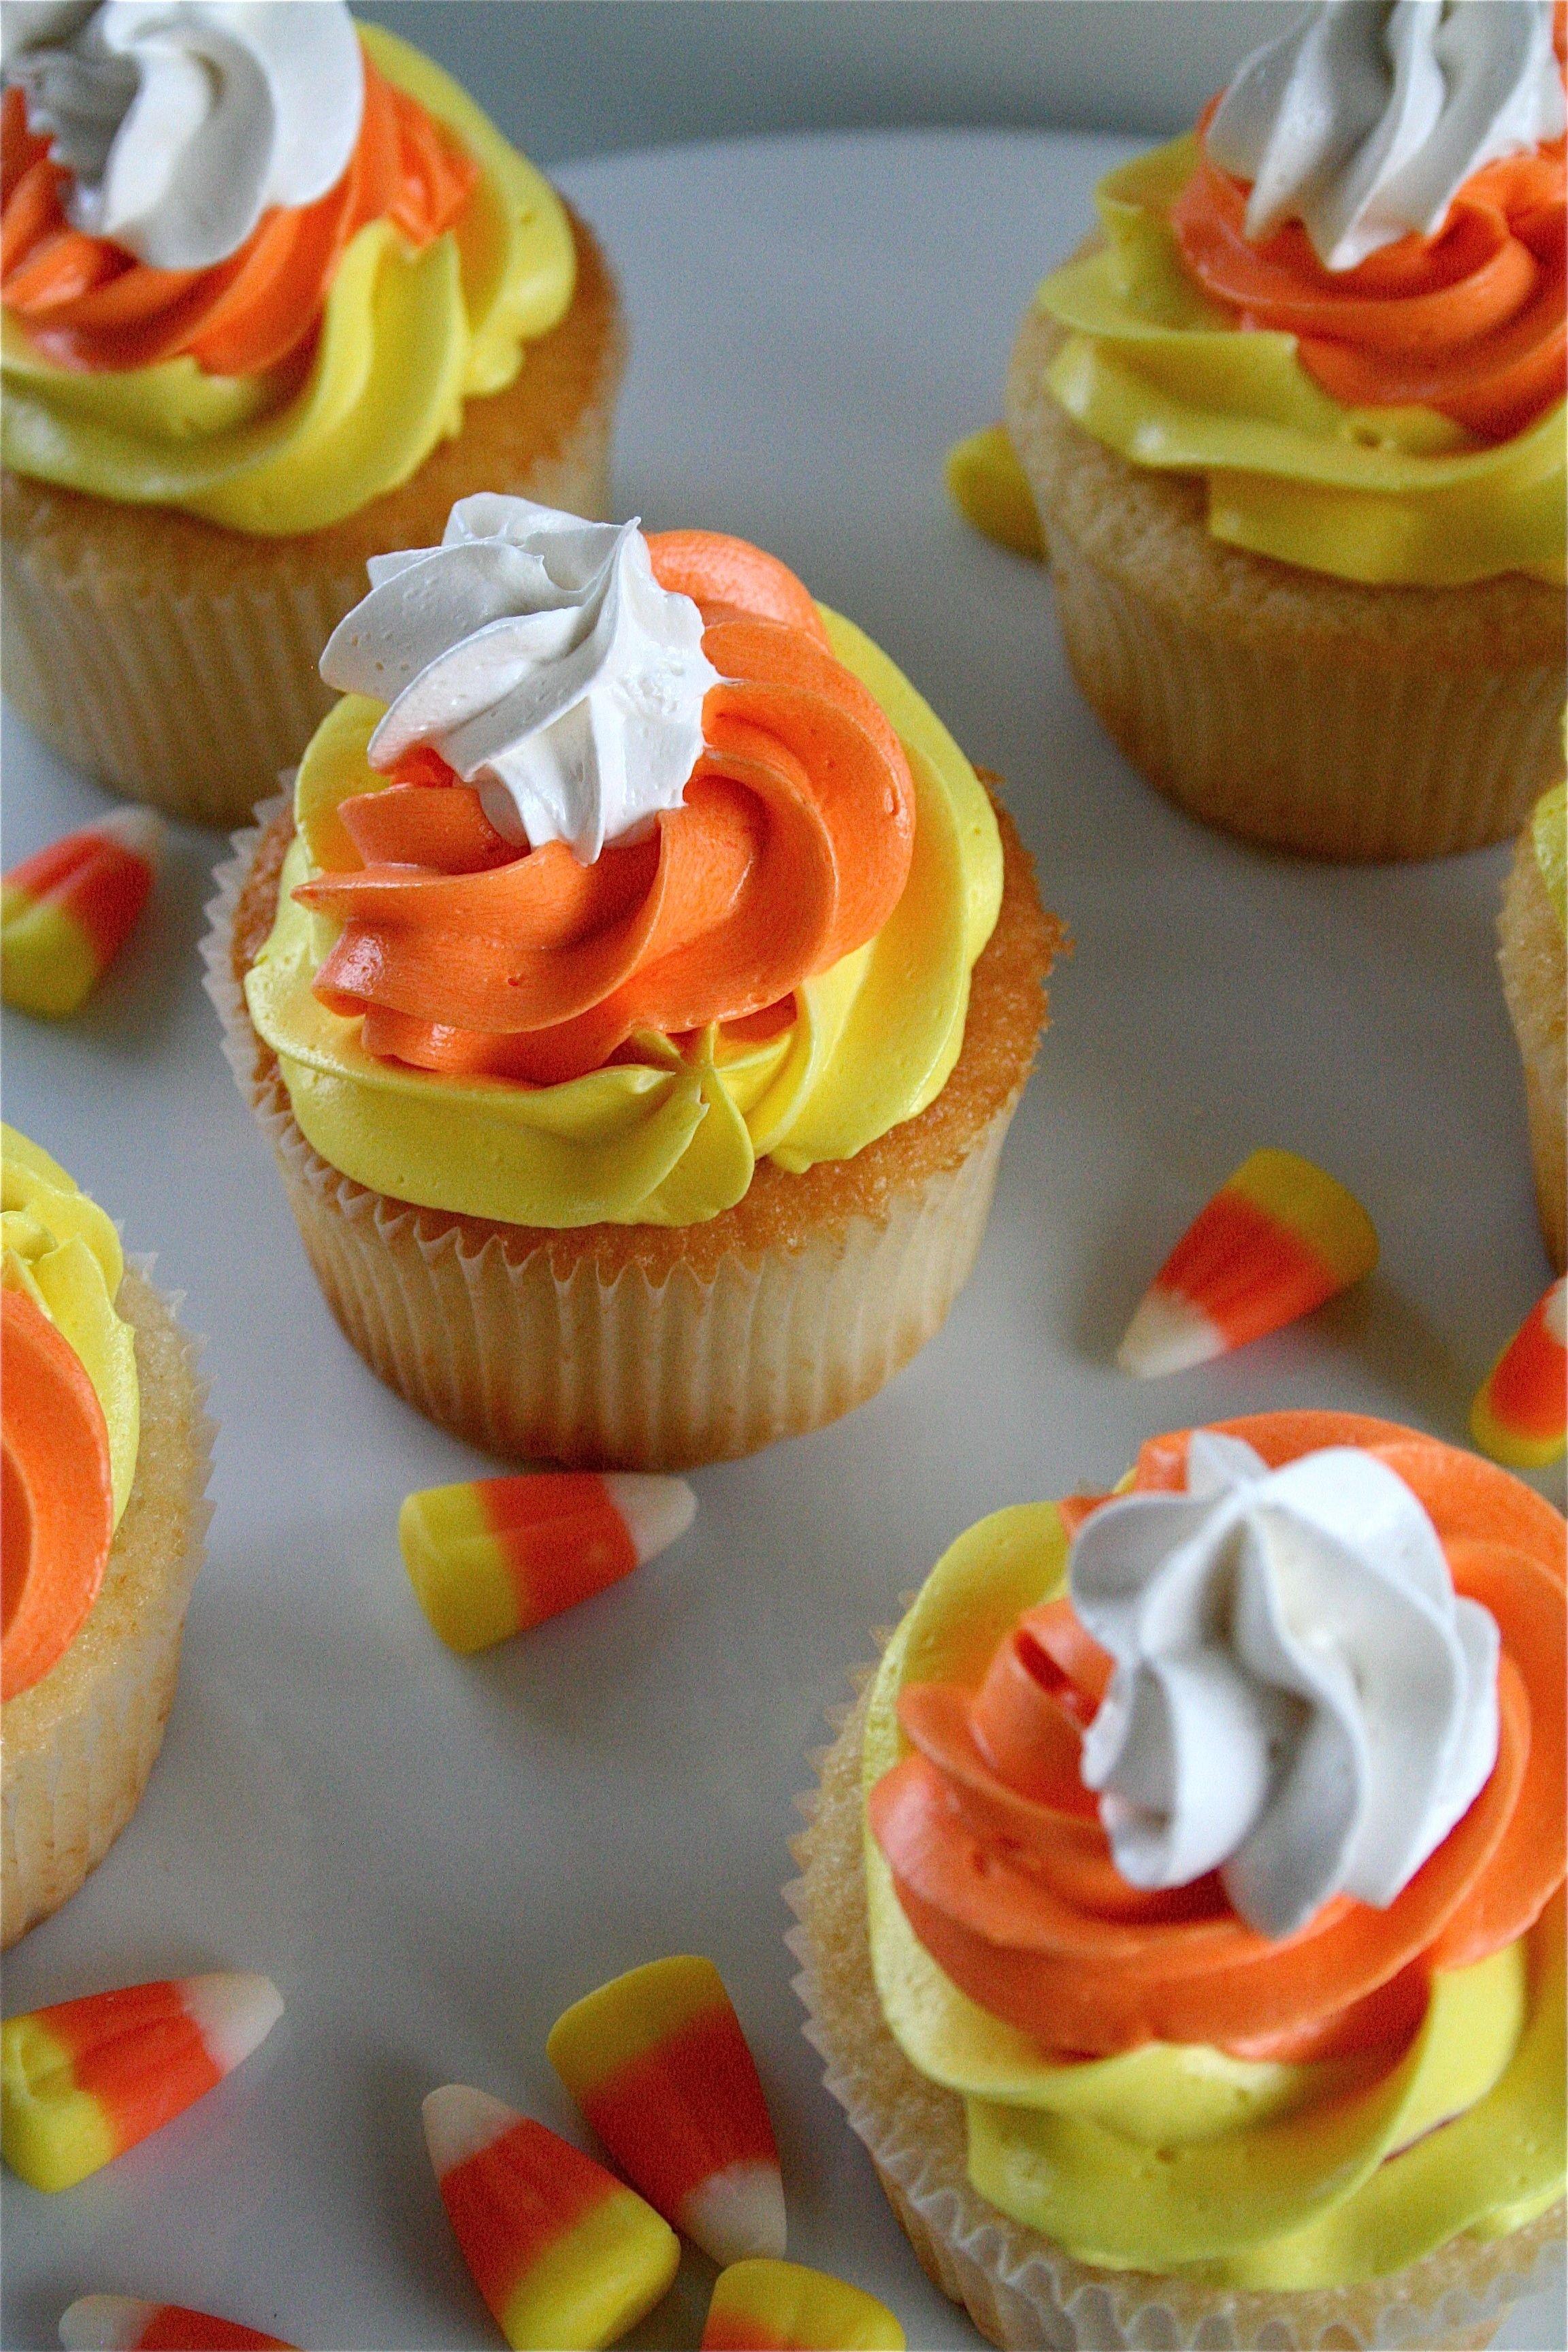 10 Best Halloween Cupcake Ideas For Kids 34 cute halloween cupcakes easy recipes for halloween cupcake ideas 1 2020